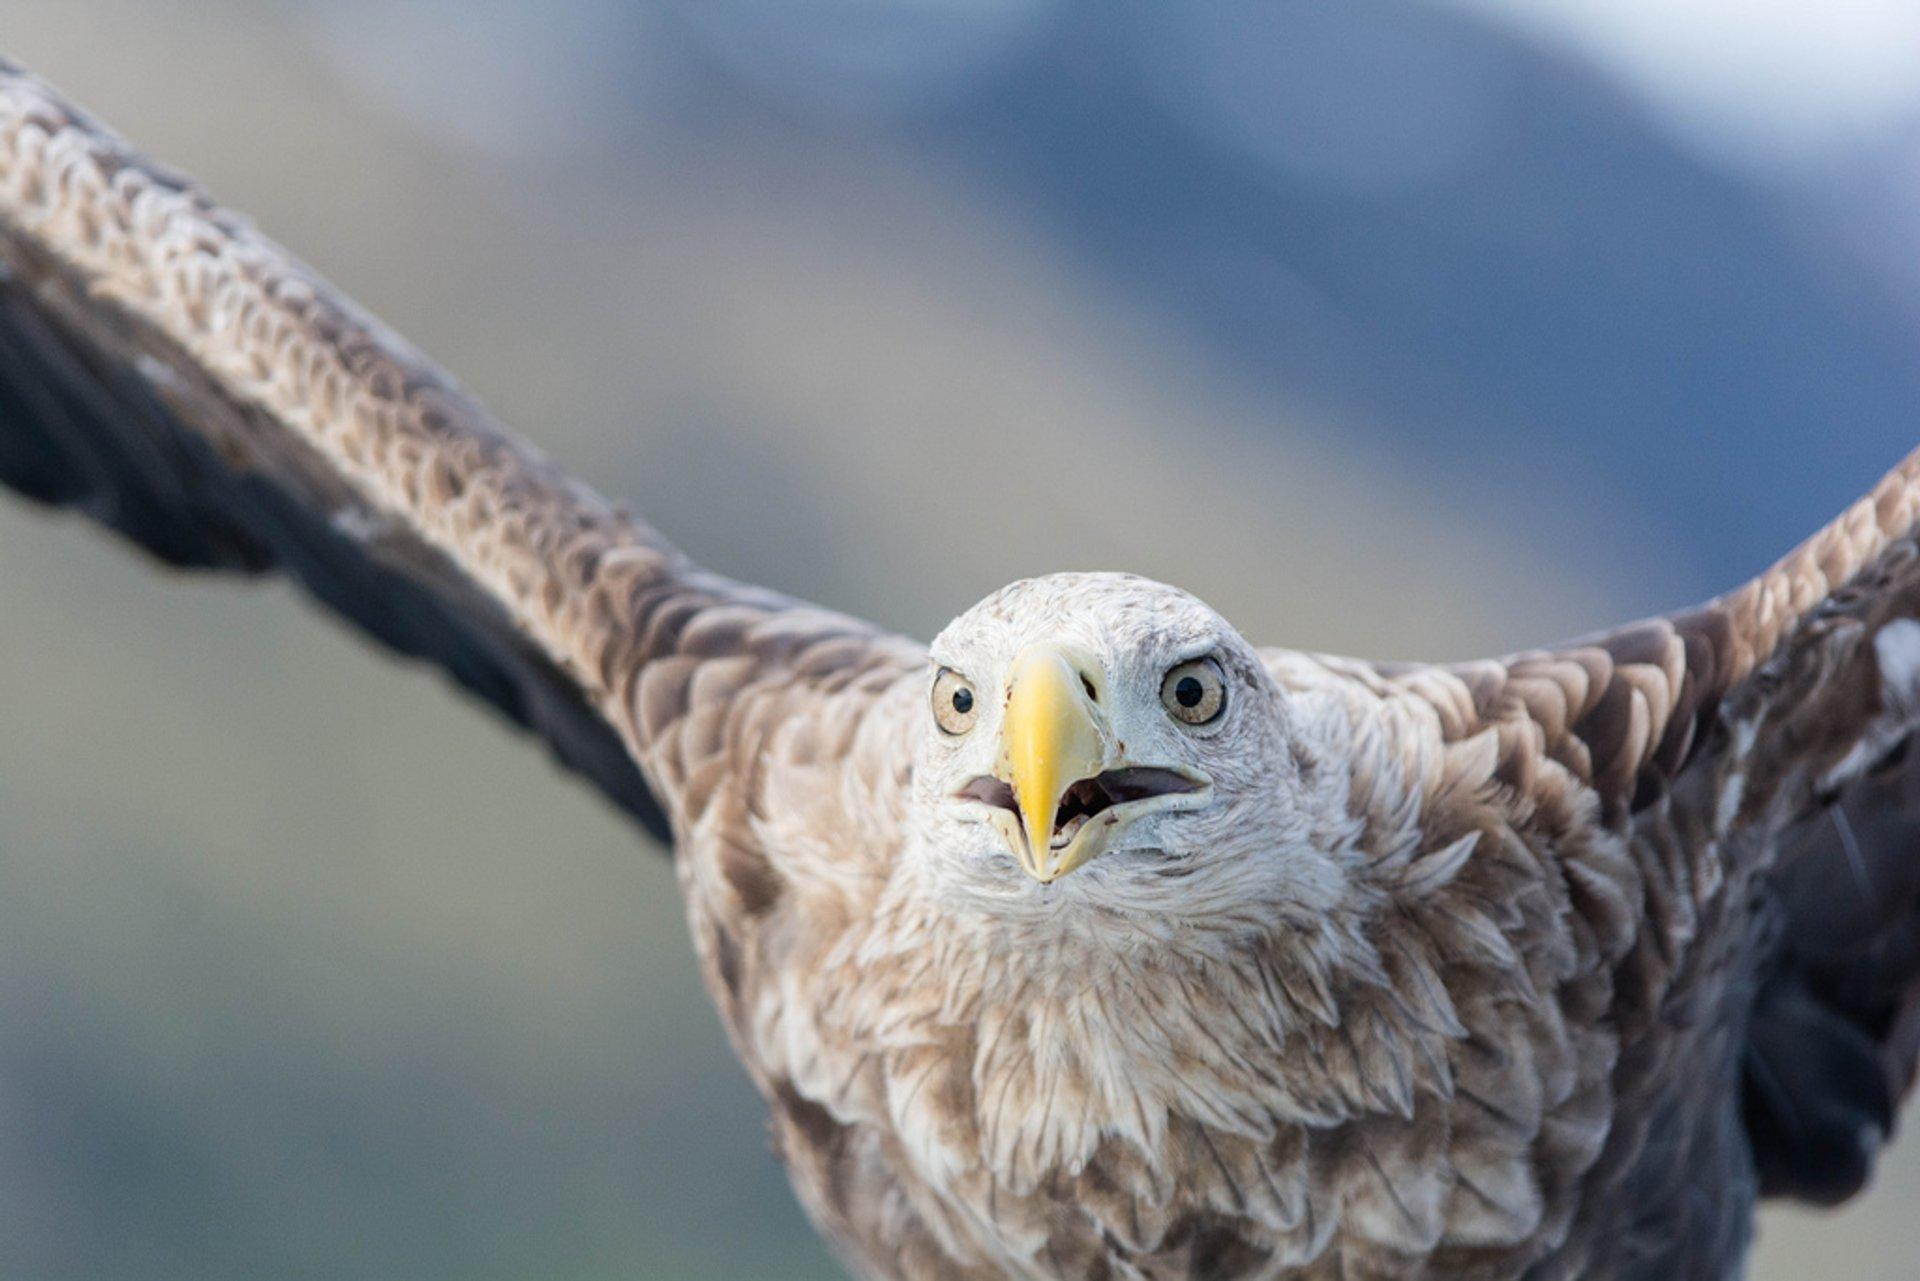 White-tailed or sea eagle, Trollfjord, Troms Fylke, Norway 2020